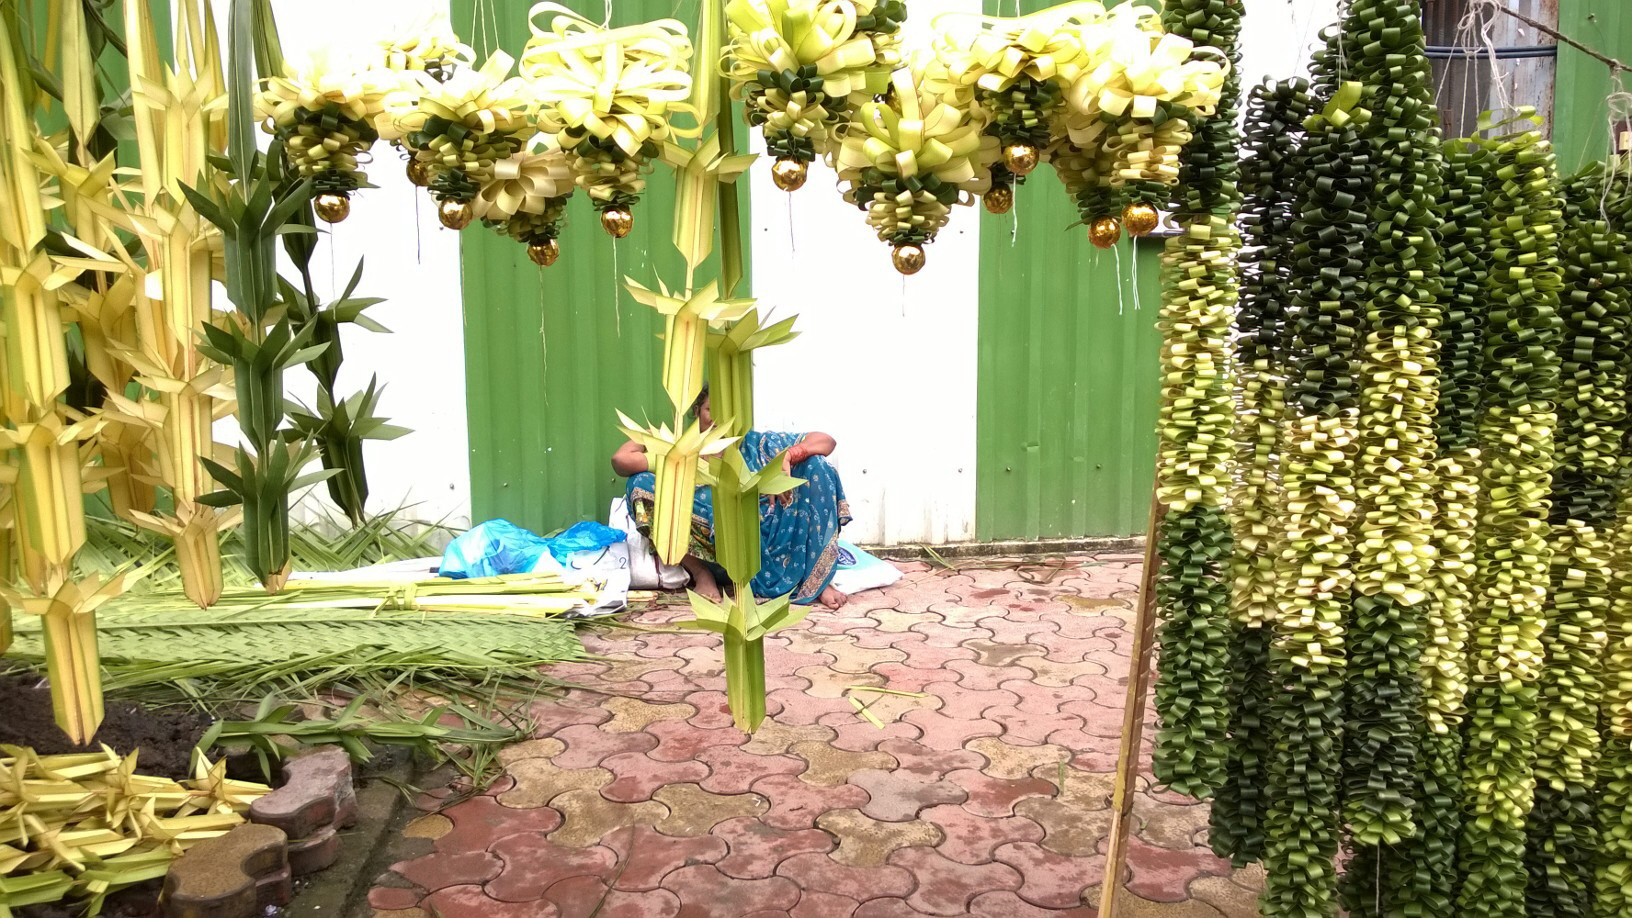 Mumbai markets welcome ganpati bappa meethi life image junglespirit Image collections